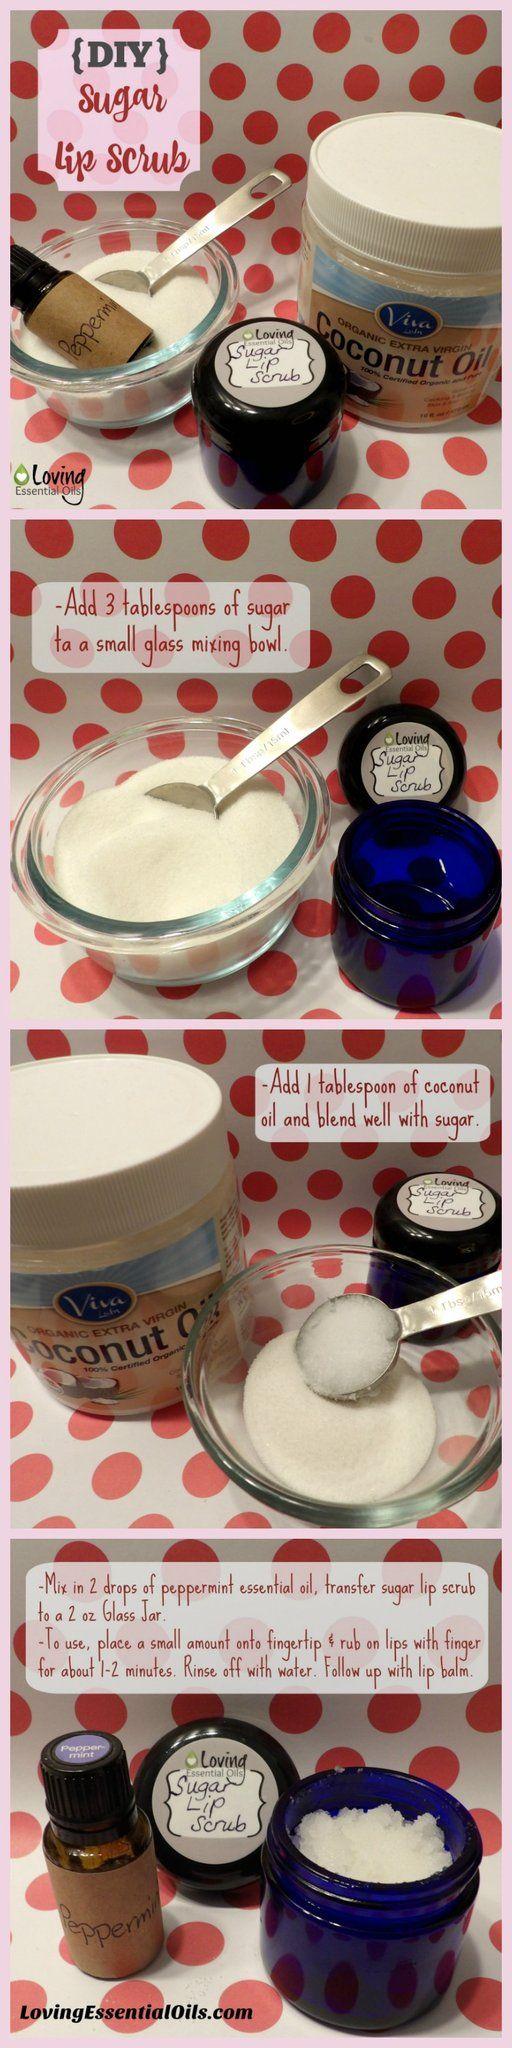 DIY Sugar Lip Scrub Tutorial http://www.lovingessentialoils.com/blogs/diy-recipes/108247942-easy-sugar-lip-scrub-for-kissable-lips Get kissable, soft lips with this sugar scrub.  Need sugar, coconut oil , peppermint essential oil and glass jar for storage.  Must try recipe!